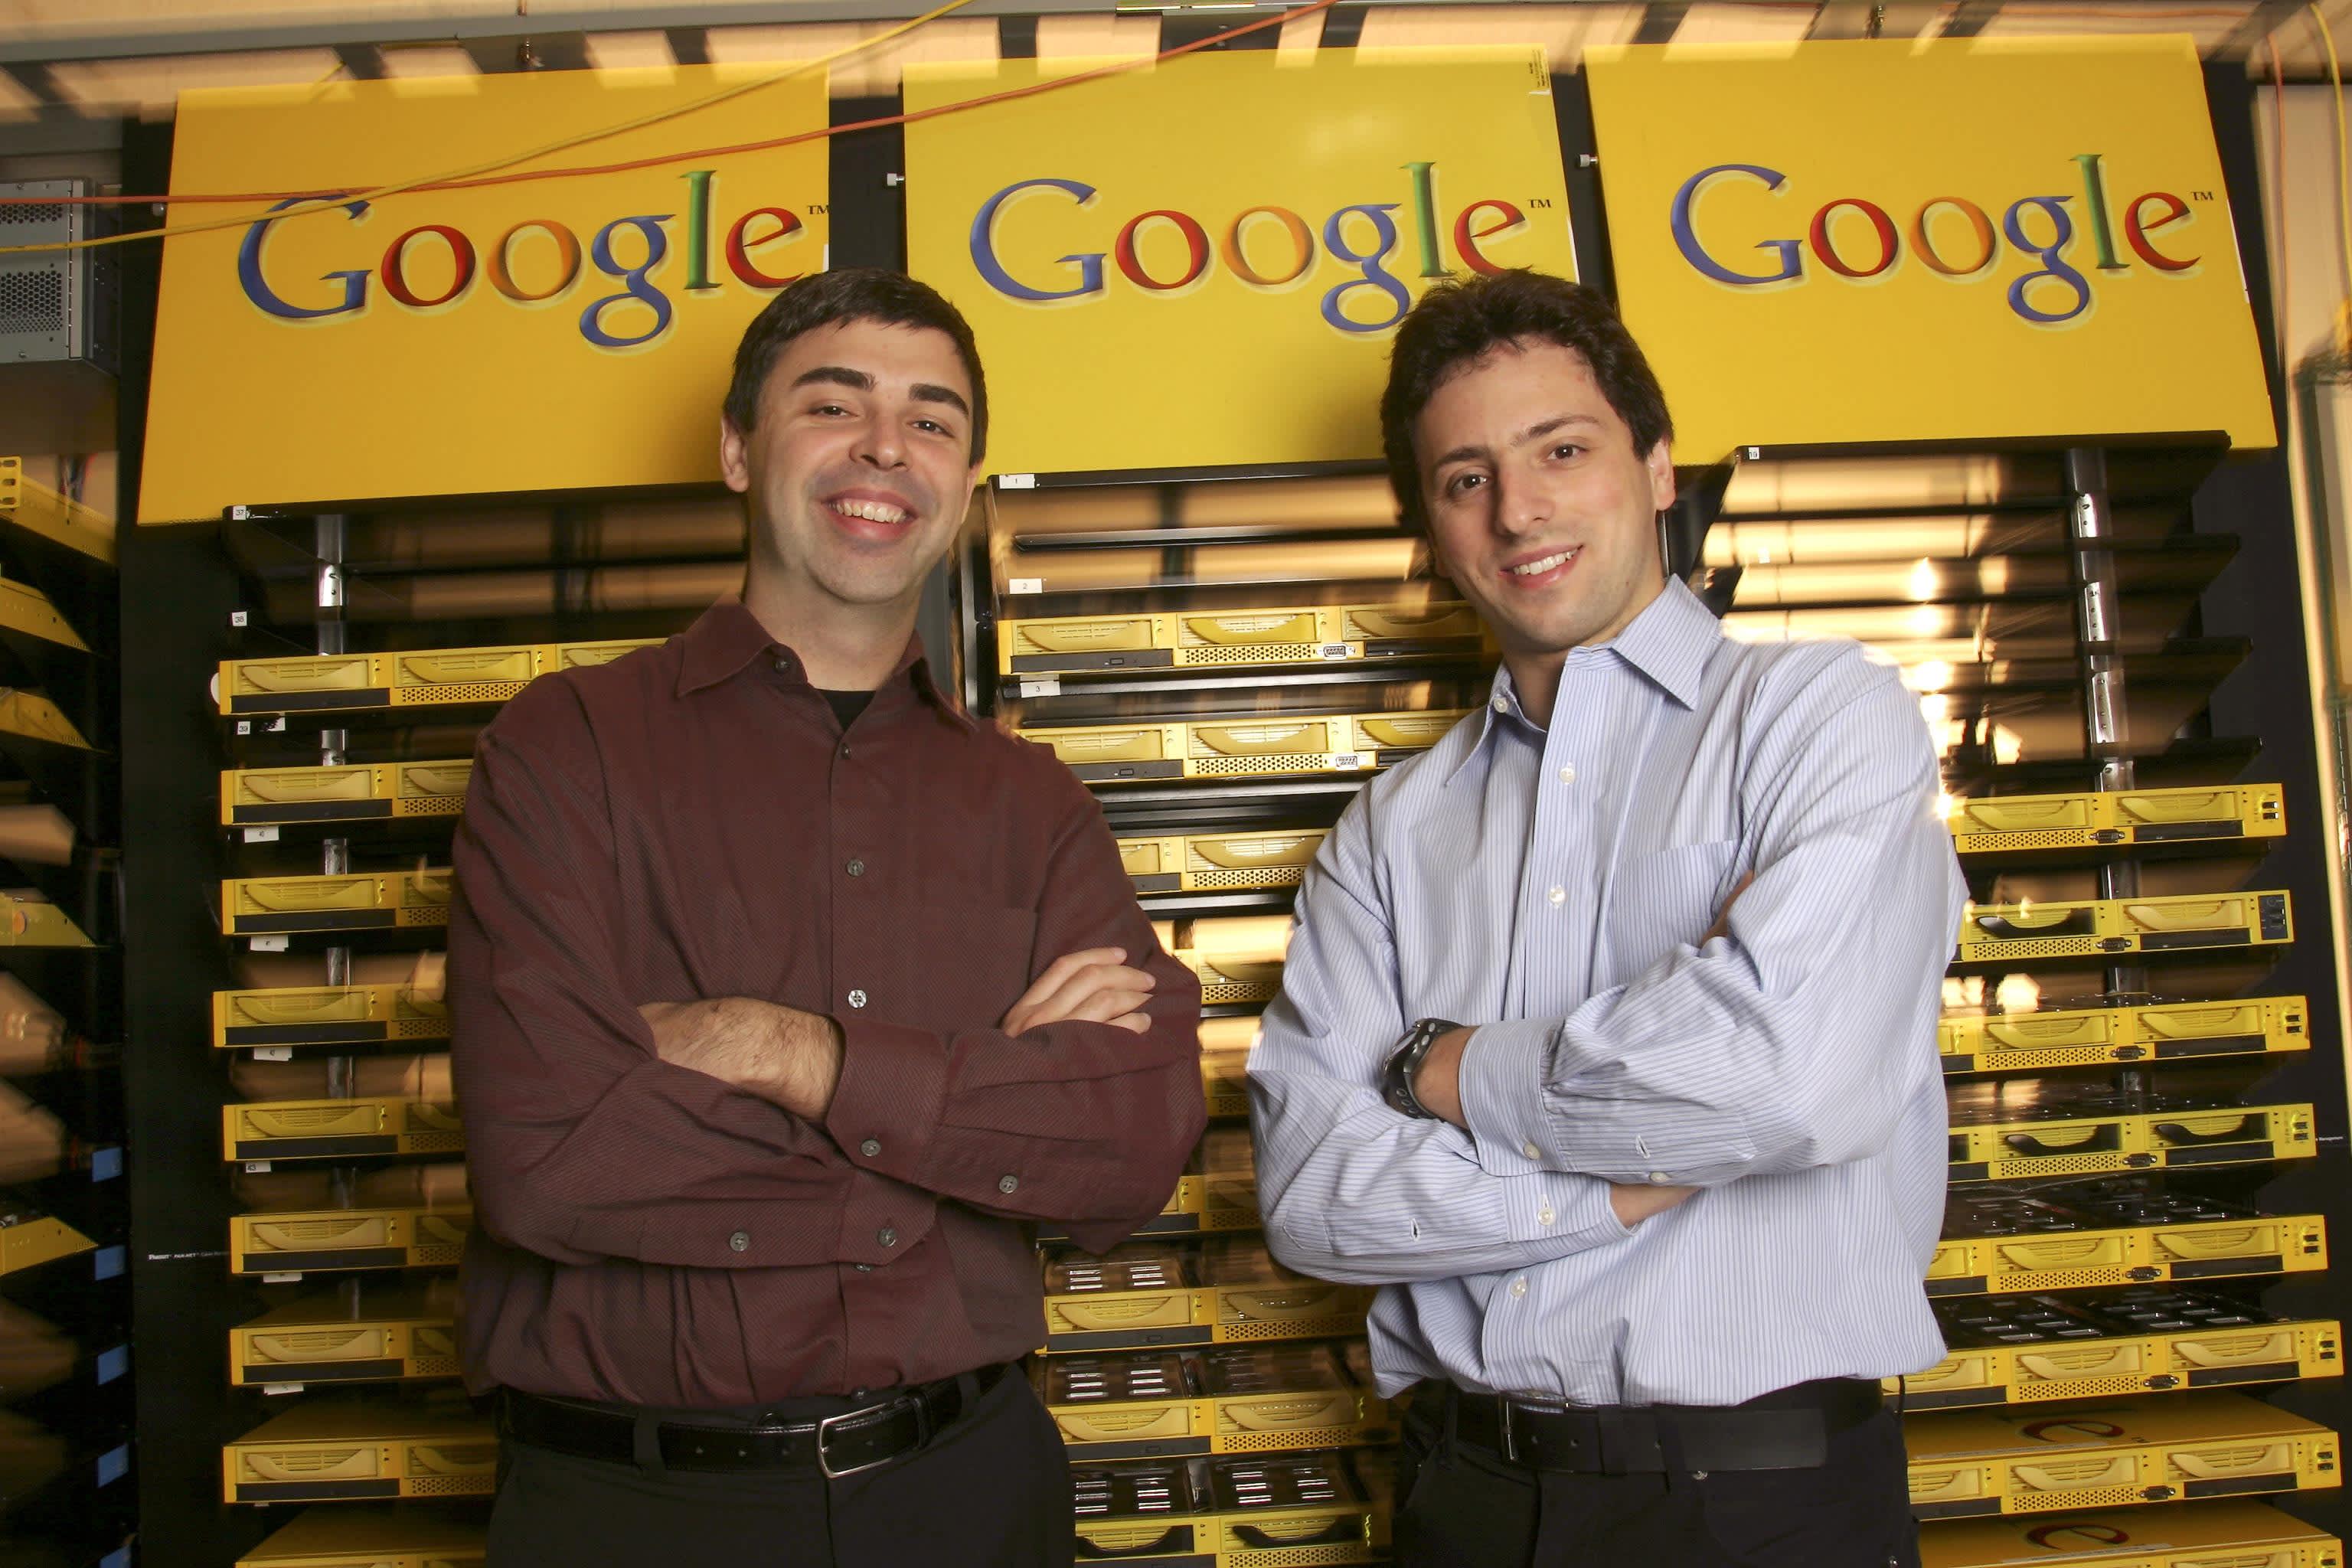 An early Google employee filmed inside the company's garage office in 1998—take a look